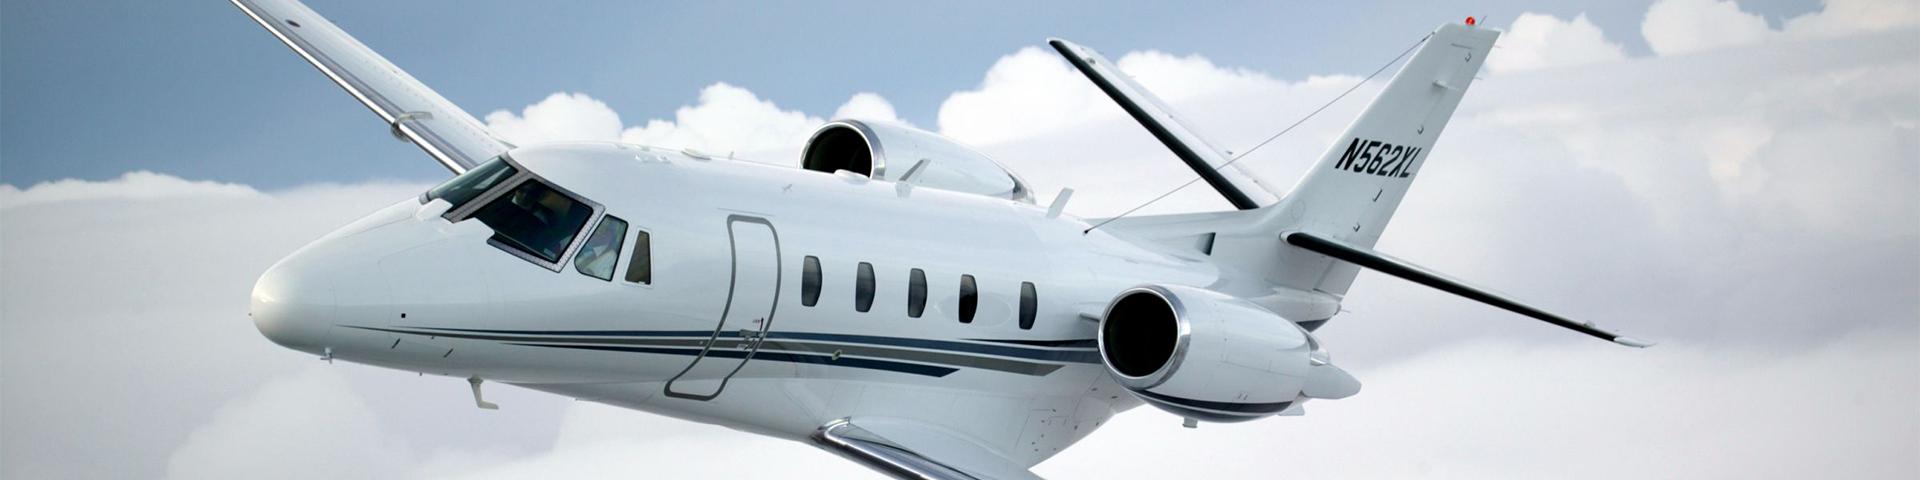 gulfstream g450 - Gulfstream G450 Private Jet